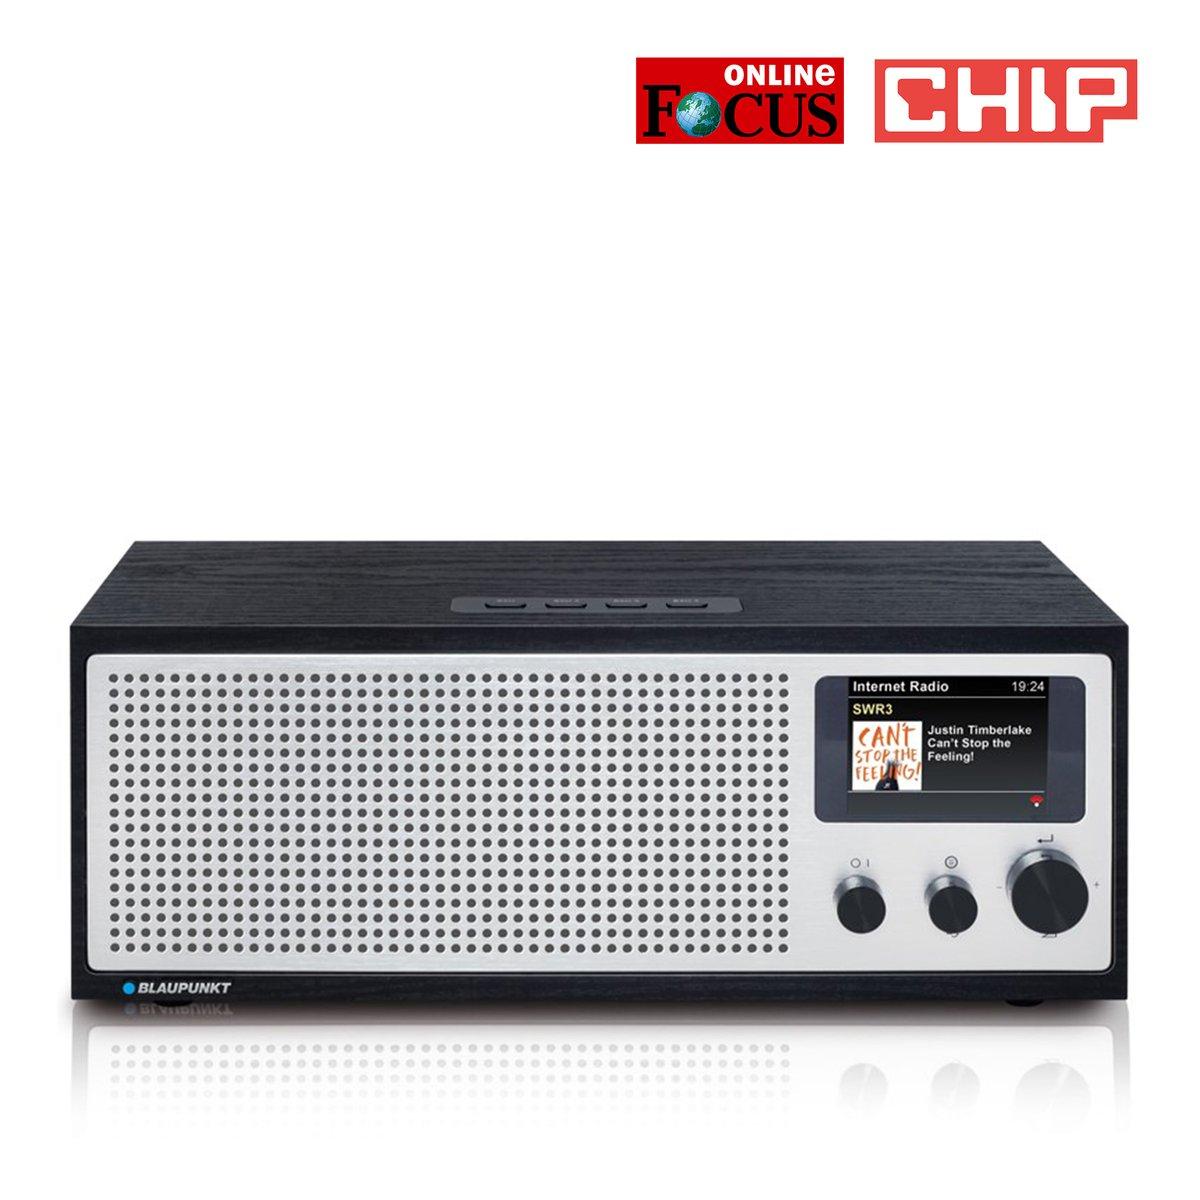 Blaupunkt NAPOLI Internetradio mit DAB+